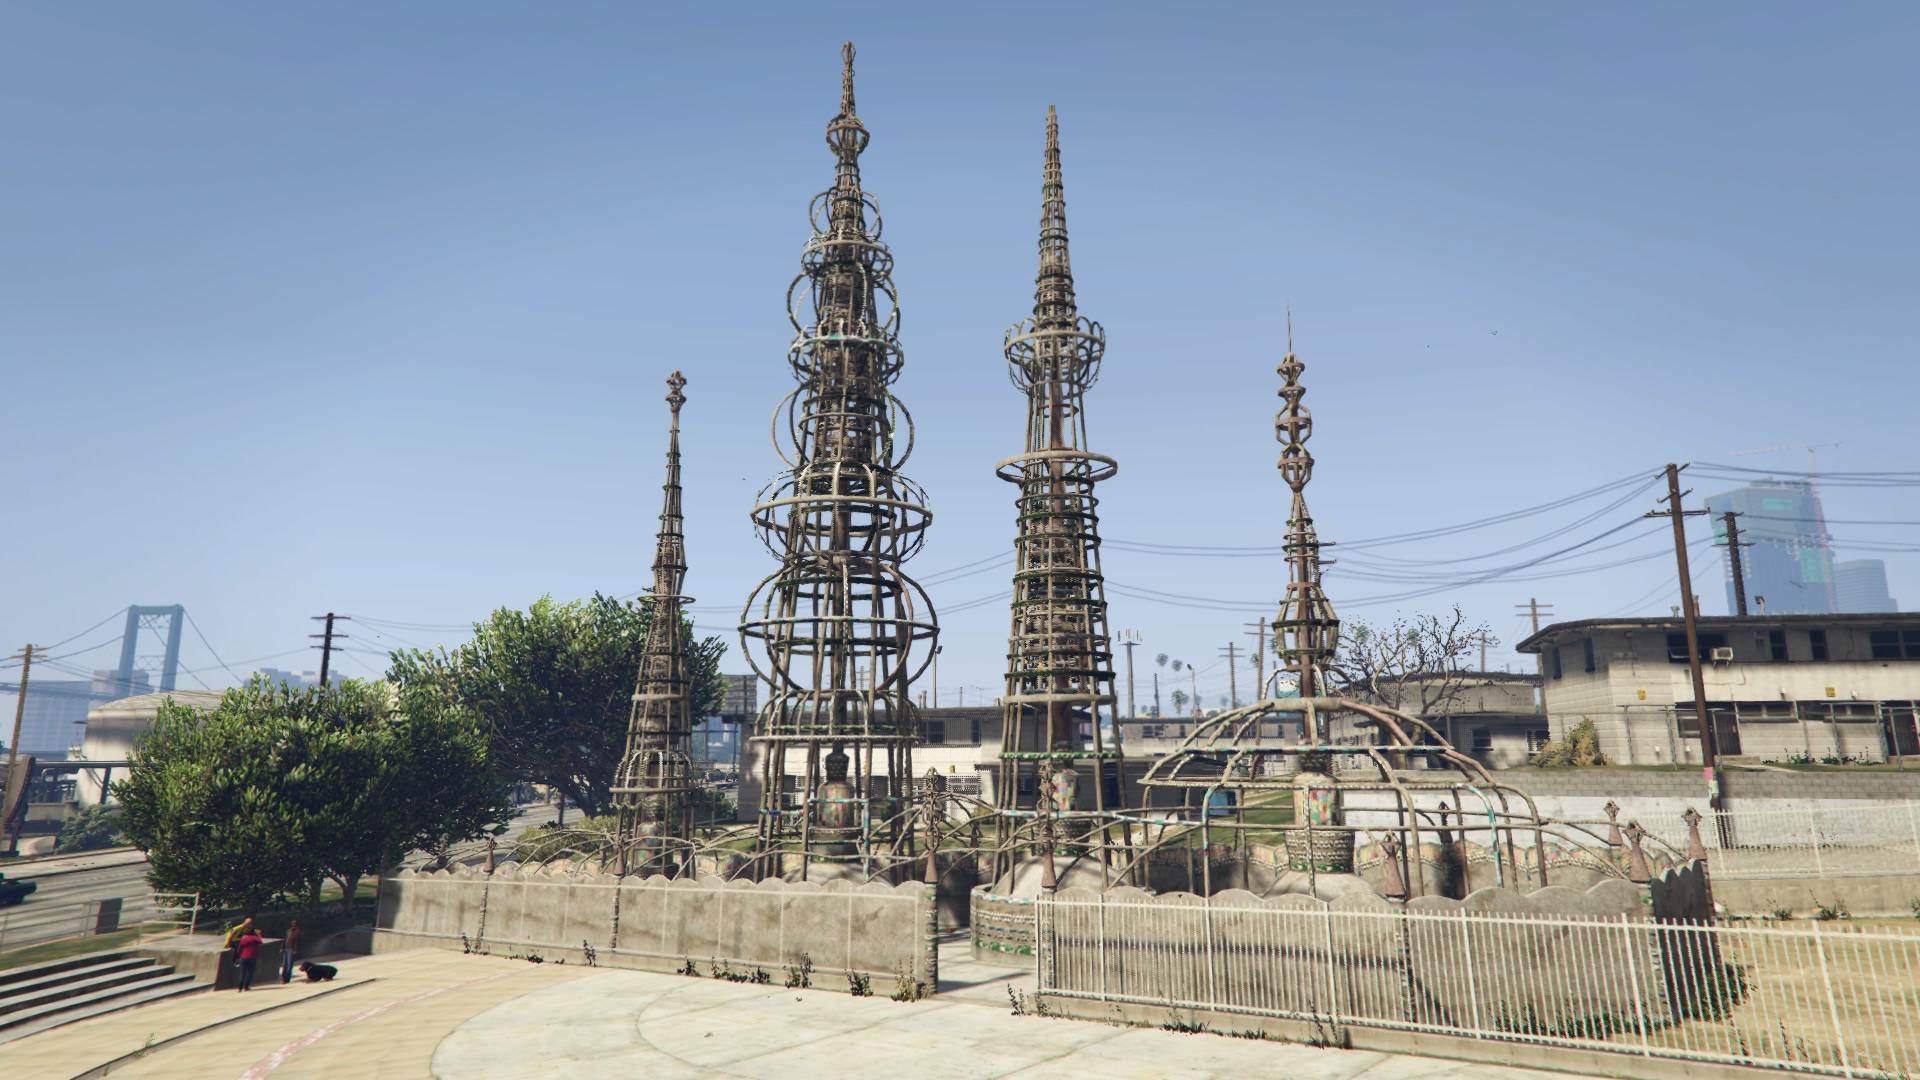 Rancho Towers